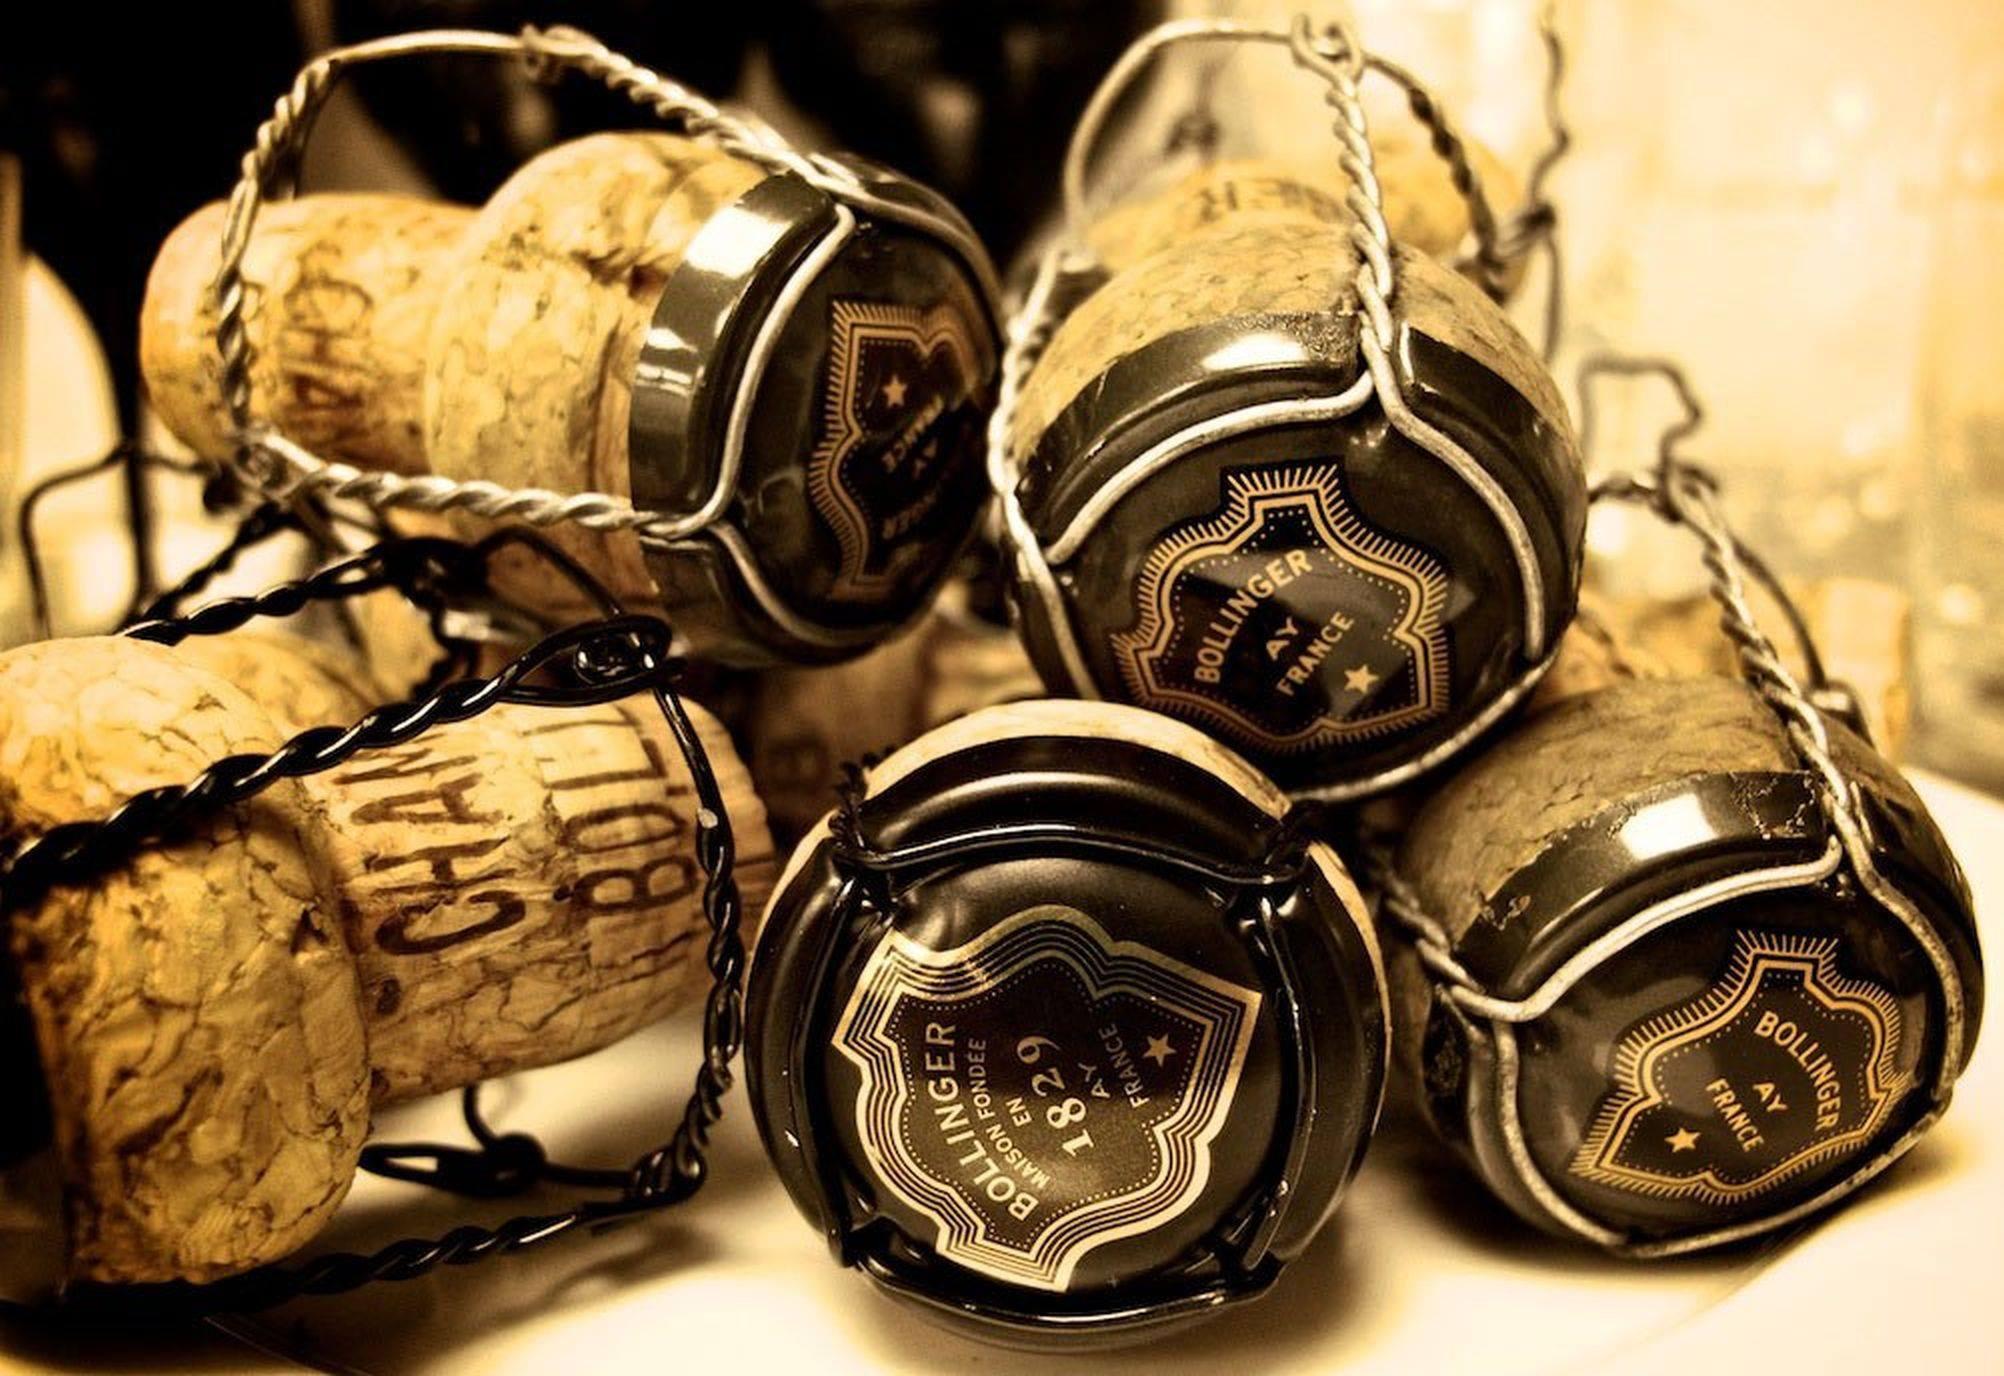 champagne, visits, Bollinger, corks, Epernay, Reims